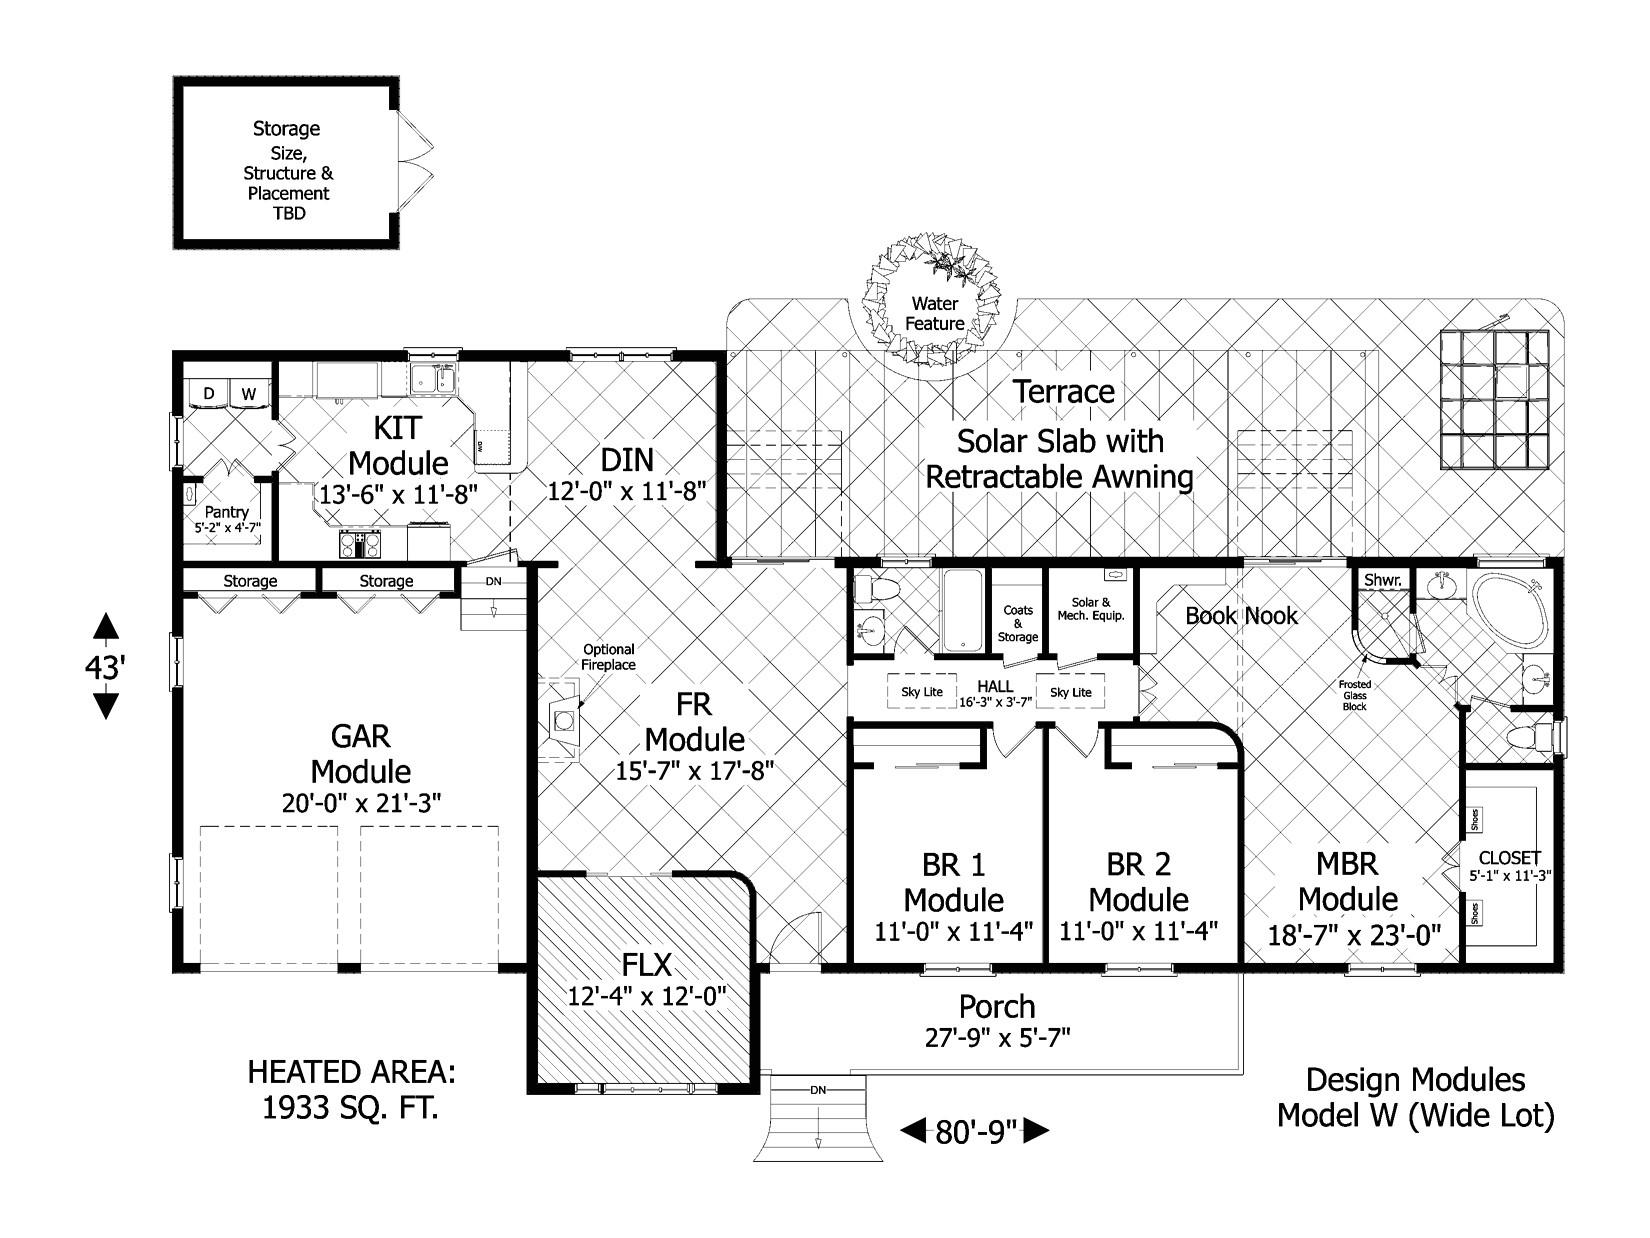 hgtv dream home 2014 floor plan luxury image result for hgtv dream home 2014 floor plan